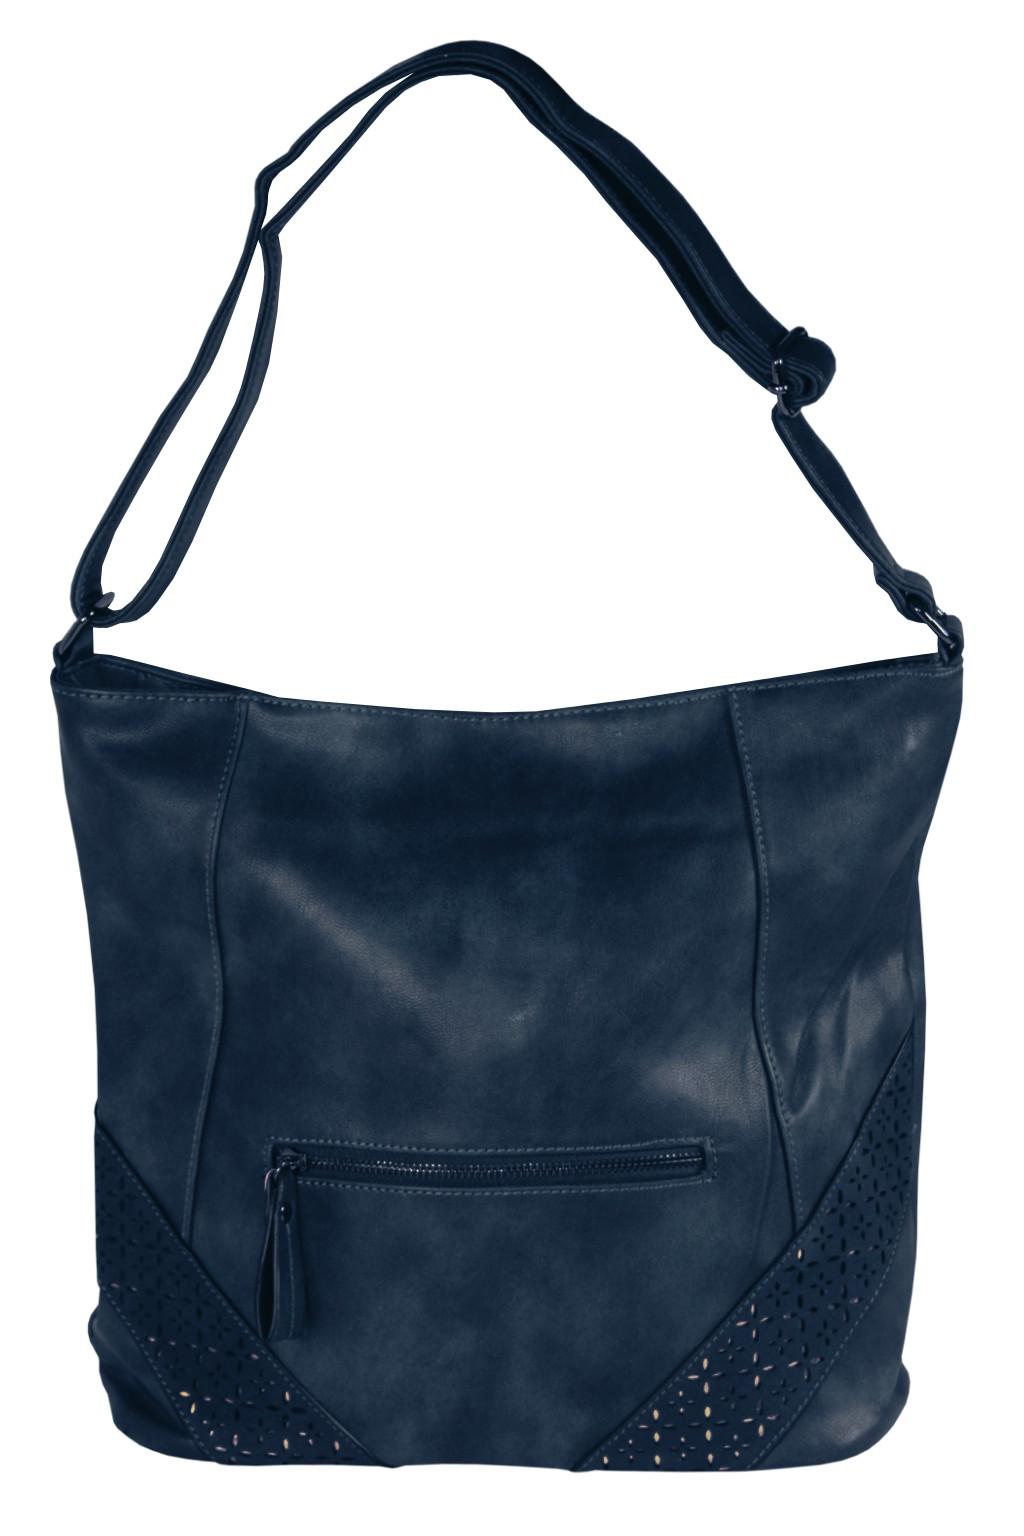 Tops Blue módní crossbody kabelka tmavě modrá